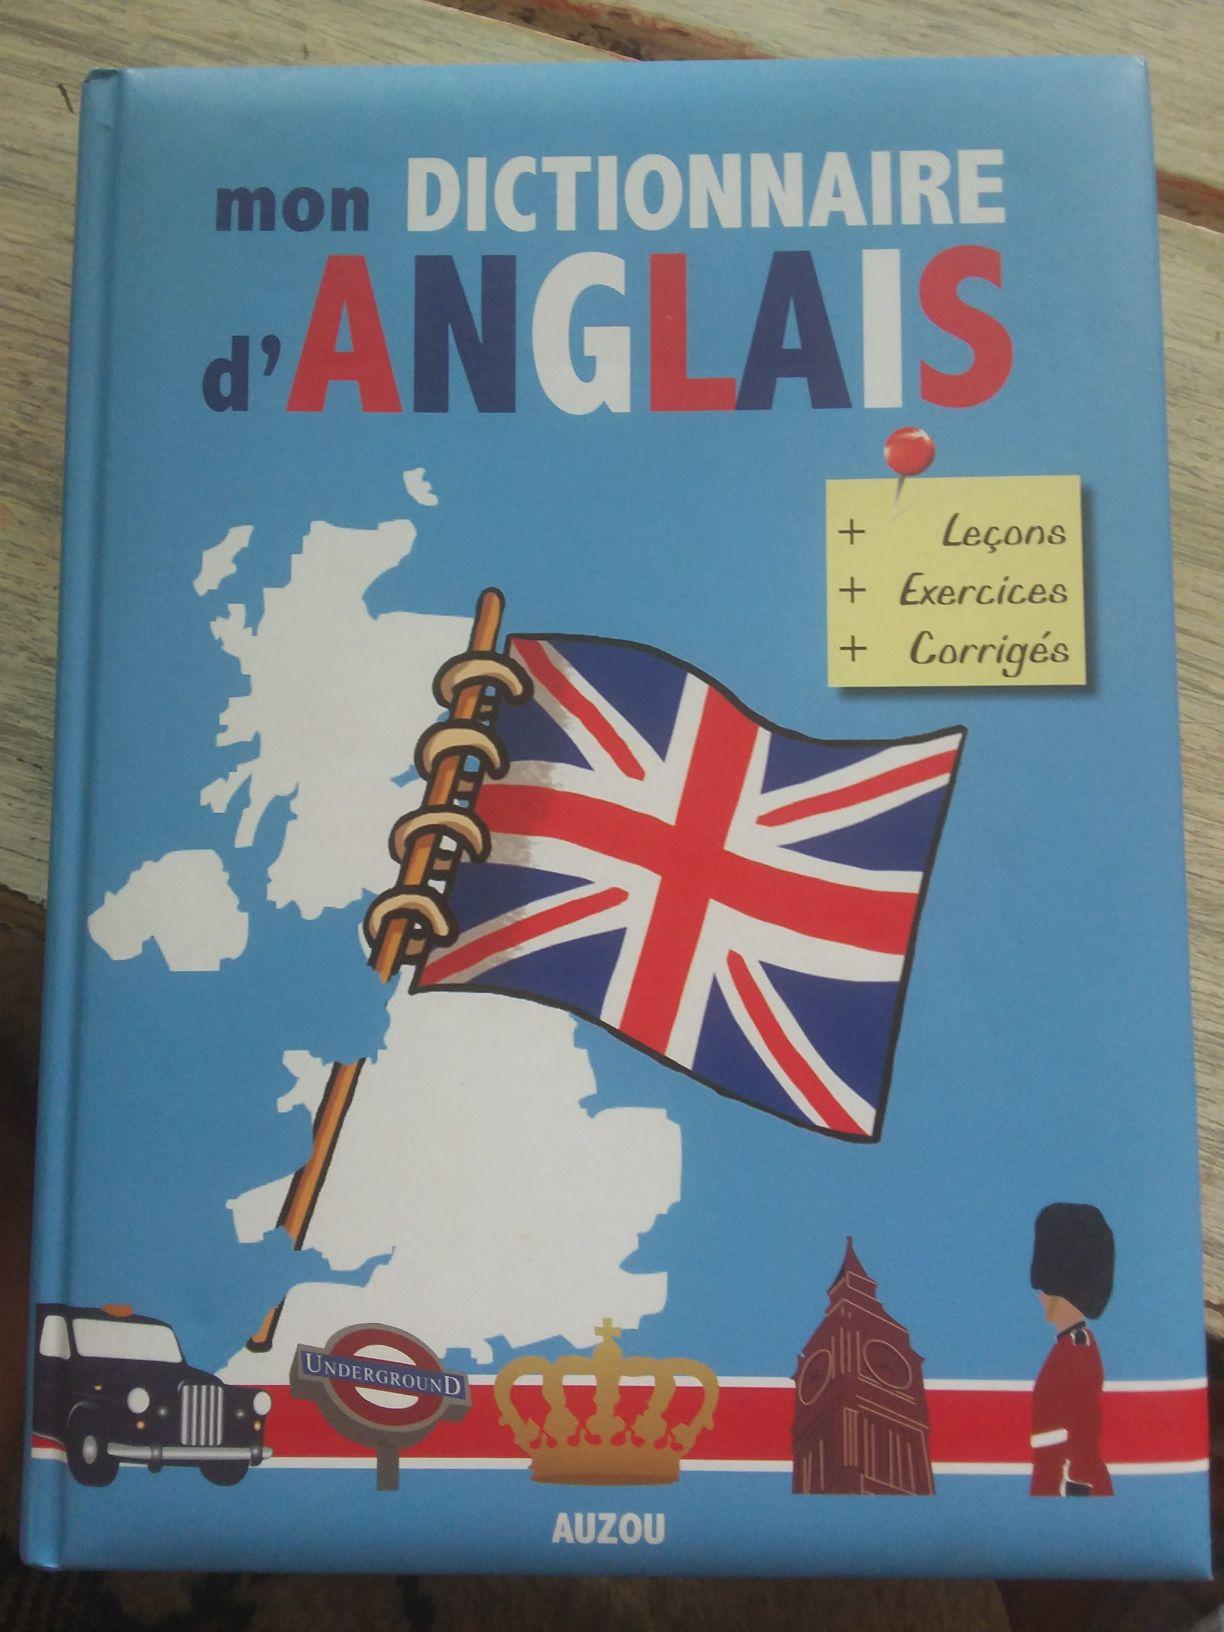 Mon dictionnaire d'ANGLAIS (+leçon, +exercices, +corrigés)